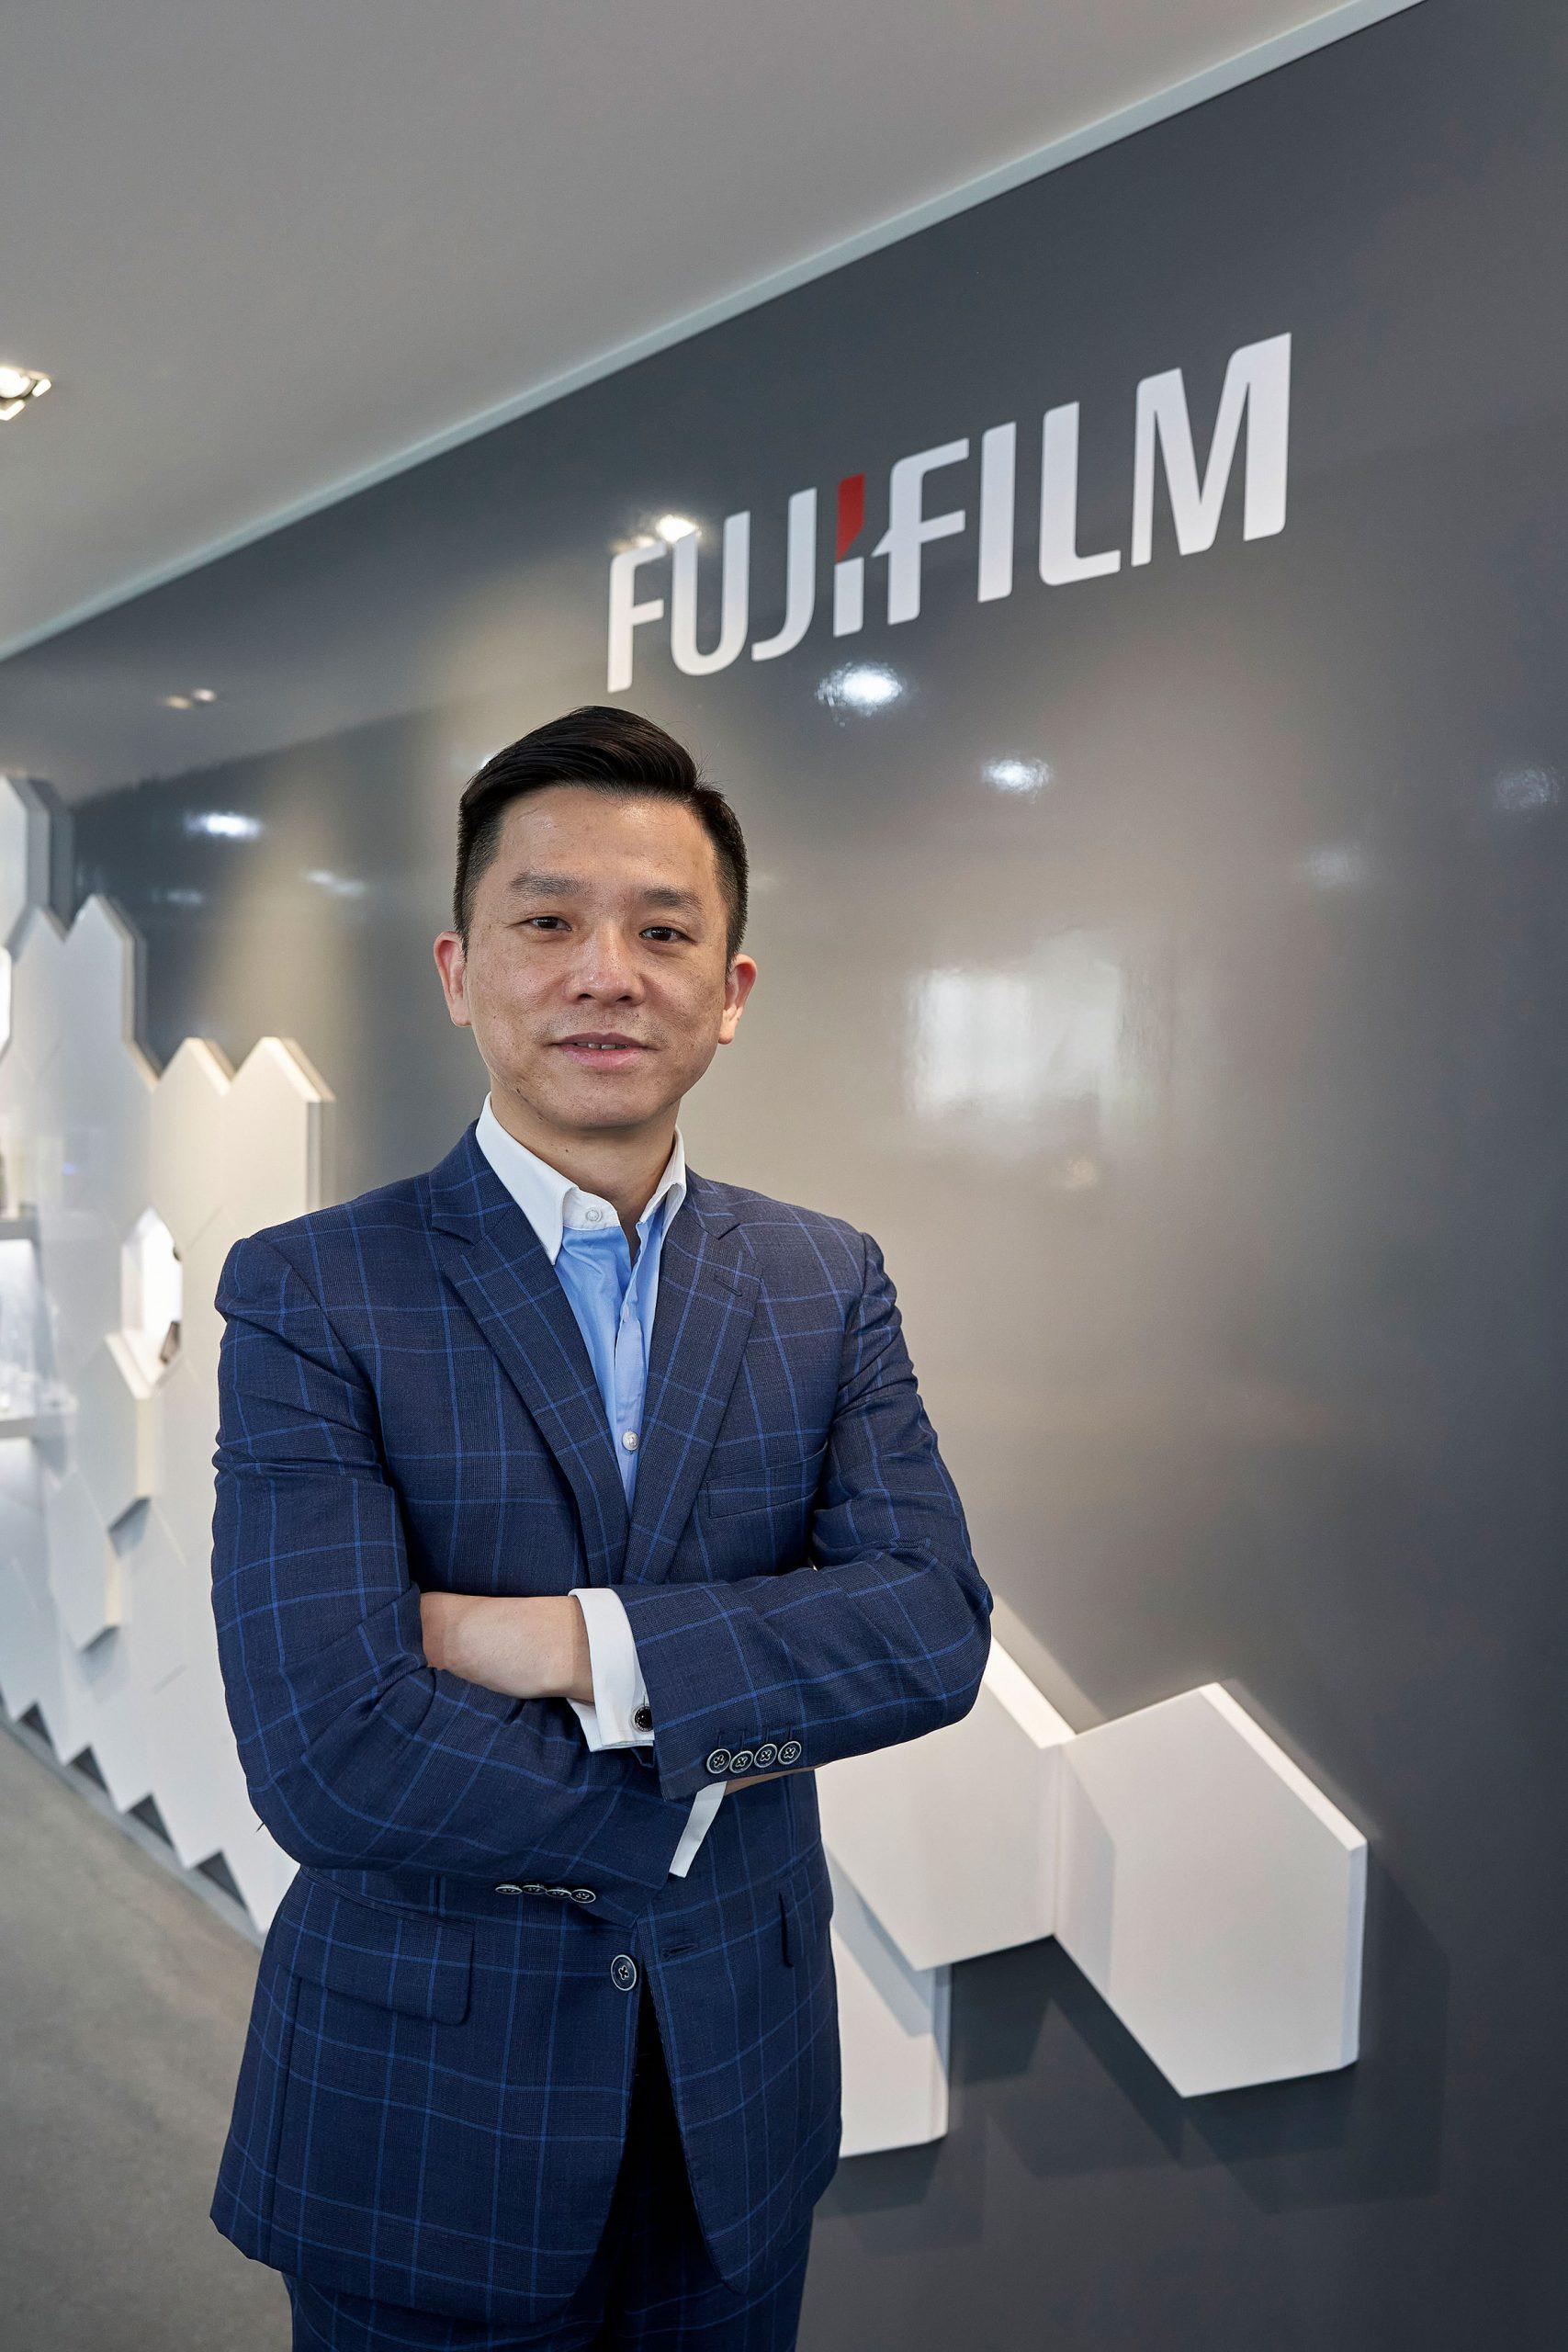 FUJIFILM BI HK市場部及供應鏈管理總監陳偉明